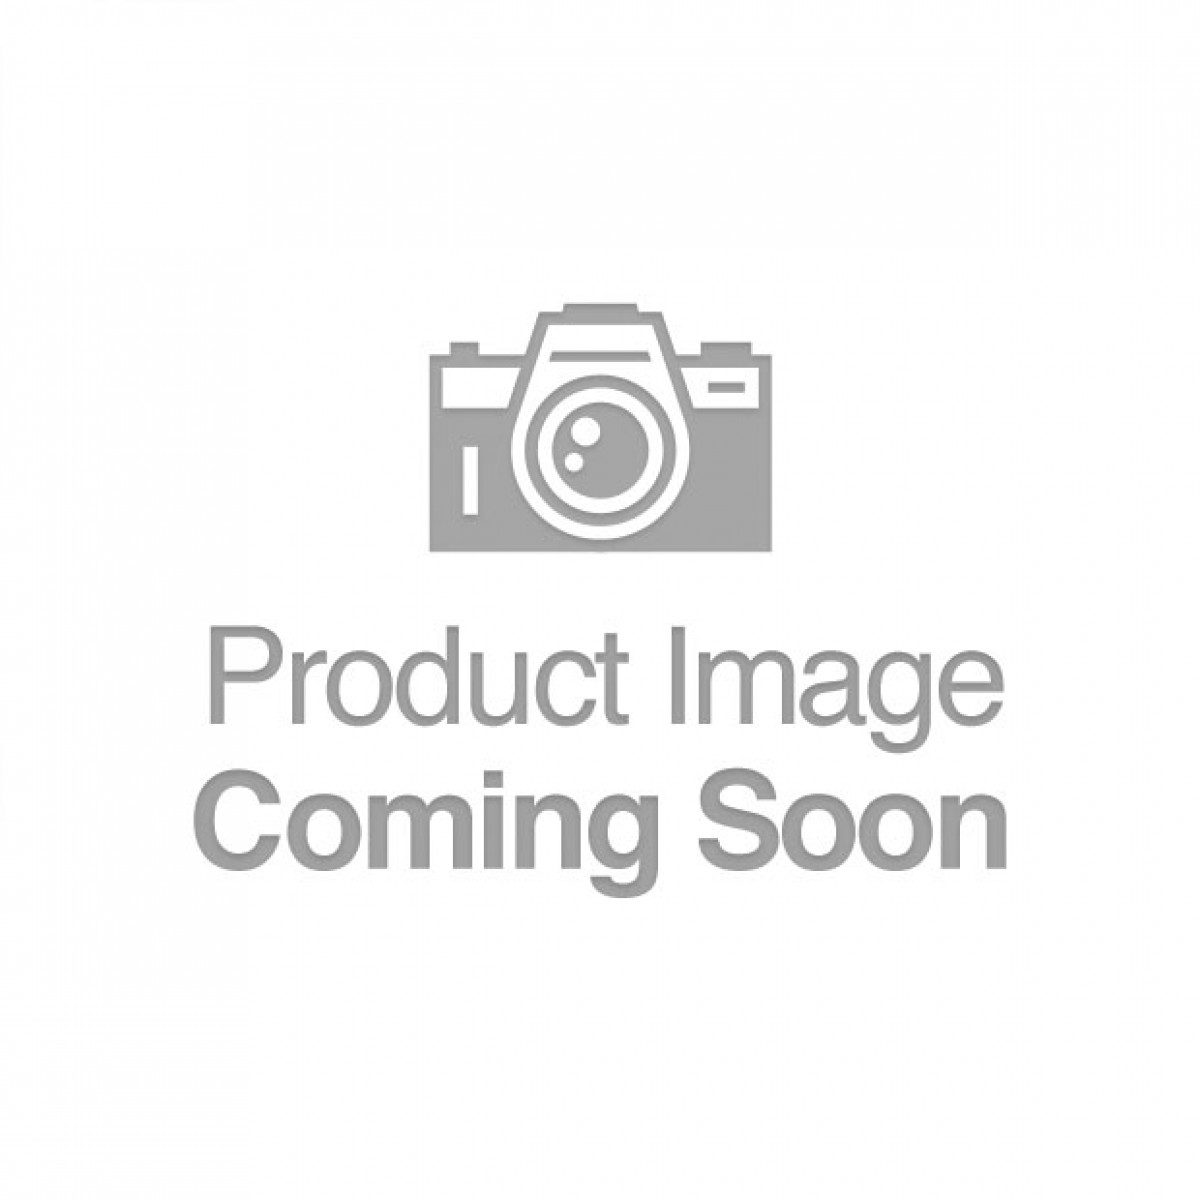 Signature Strokers ULTRASKYN Pocket Pussy Celebrity Girls - Karlie Redd